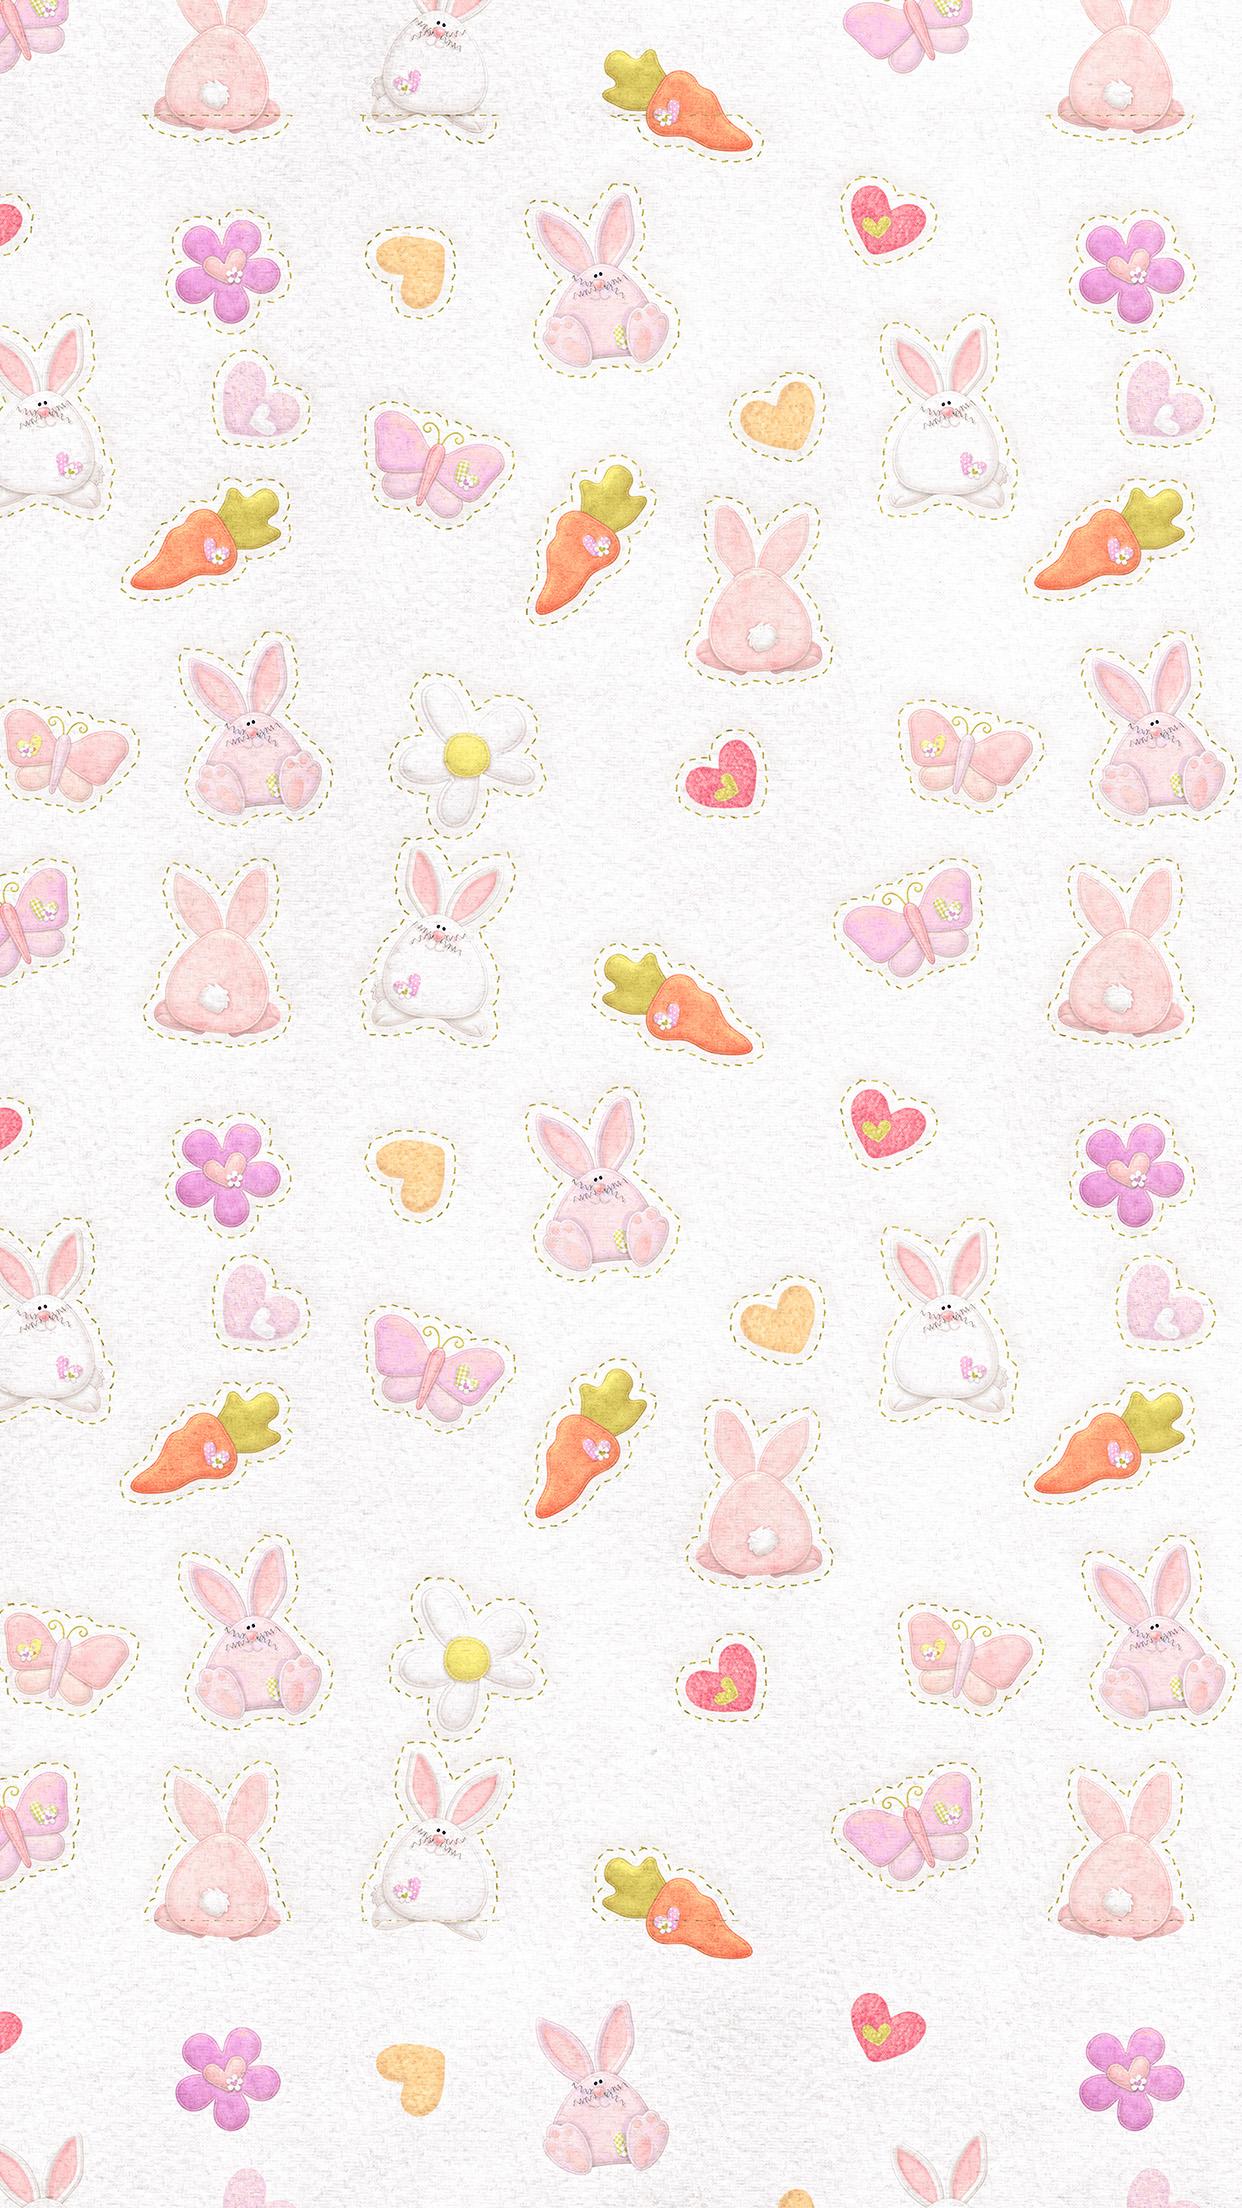 Iphonepapers Com Iphone Wallpaper Vp06 Cute Rabbit